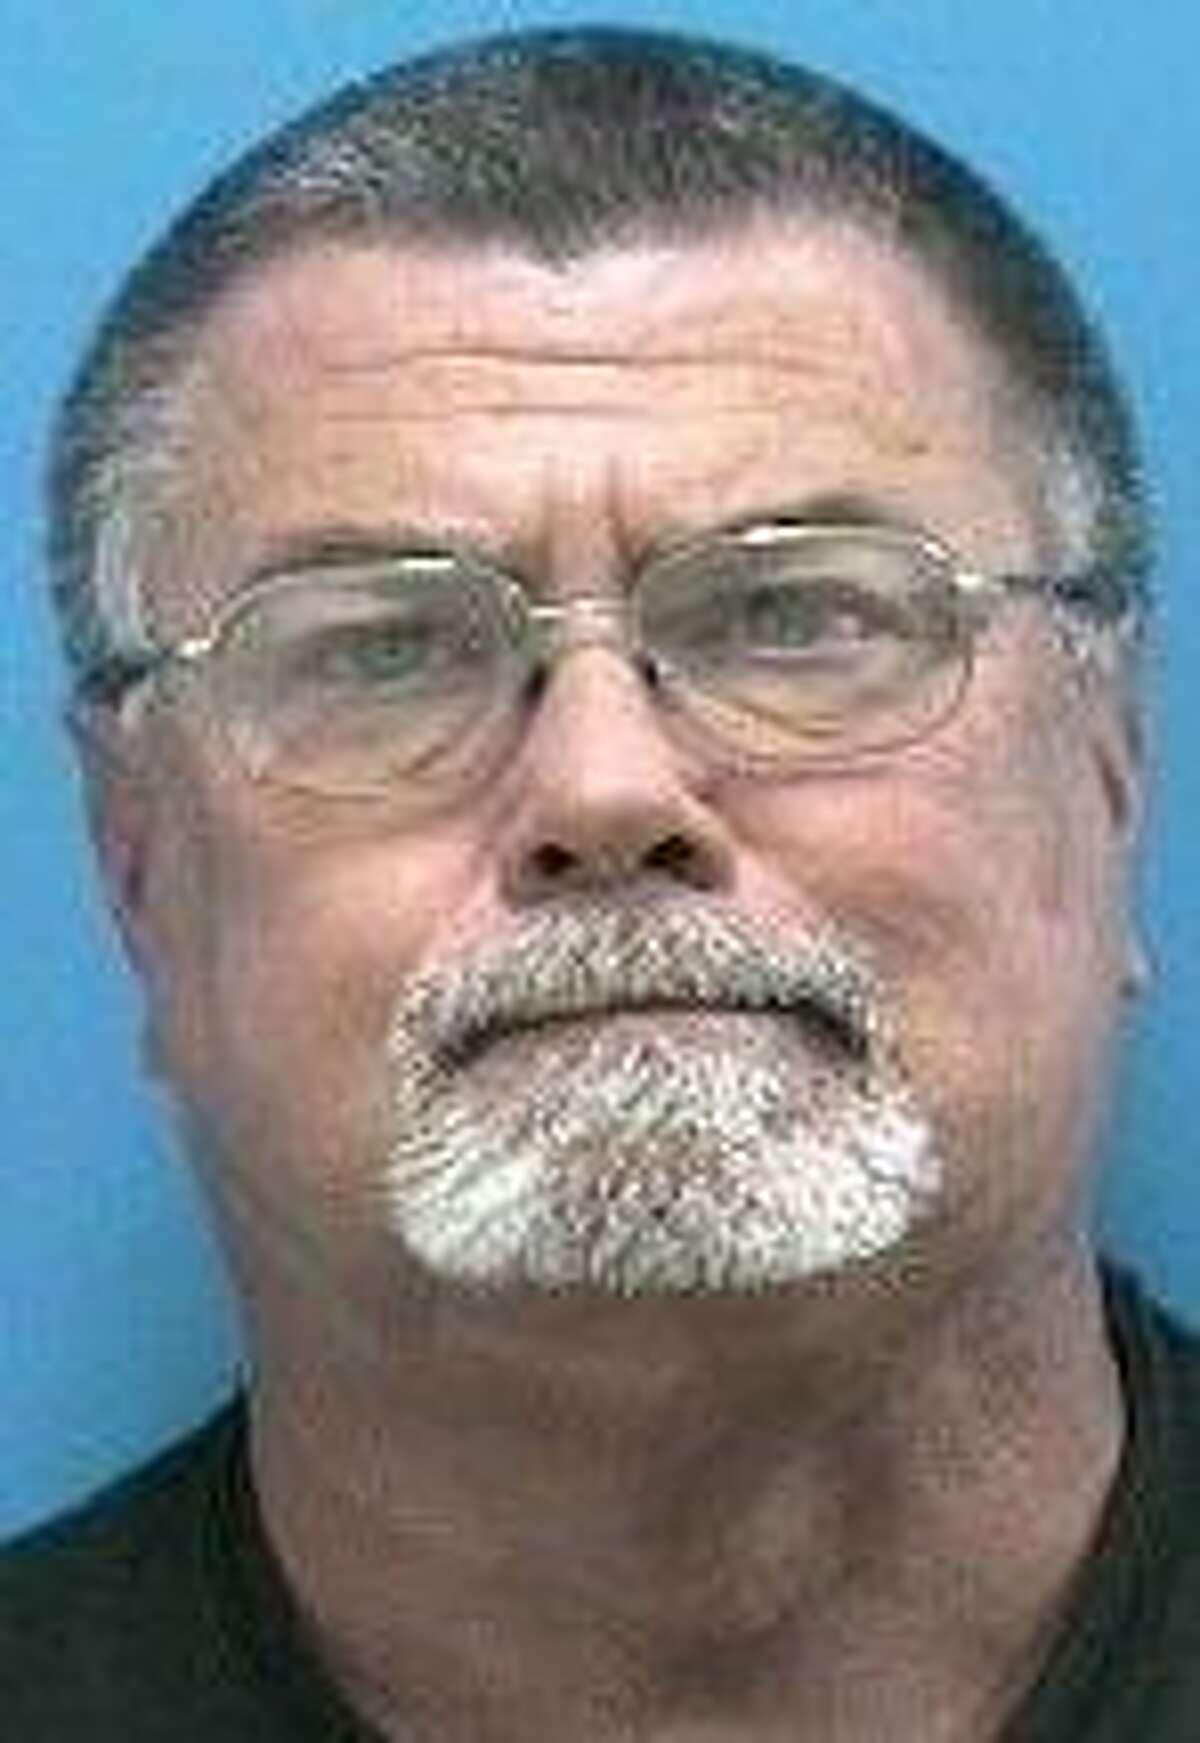 Florida man takes epic mugshot after driving naked near